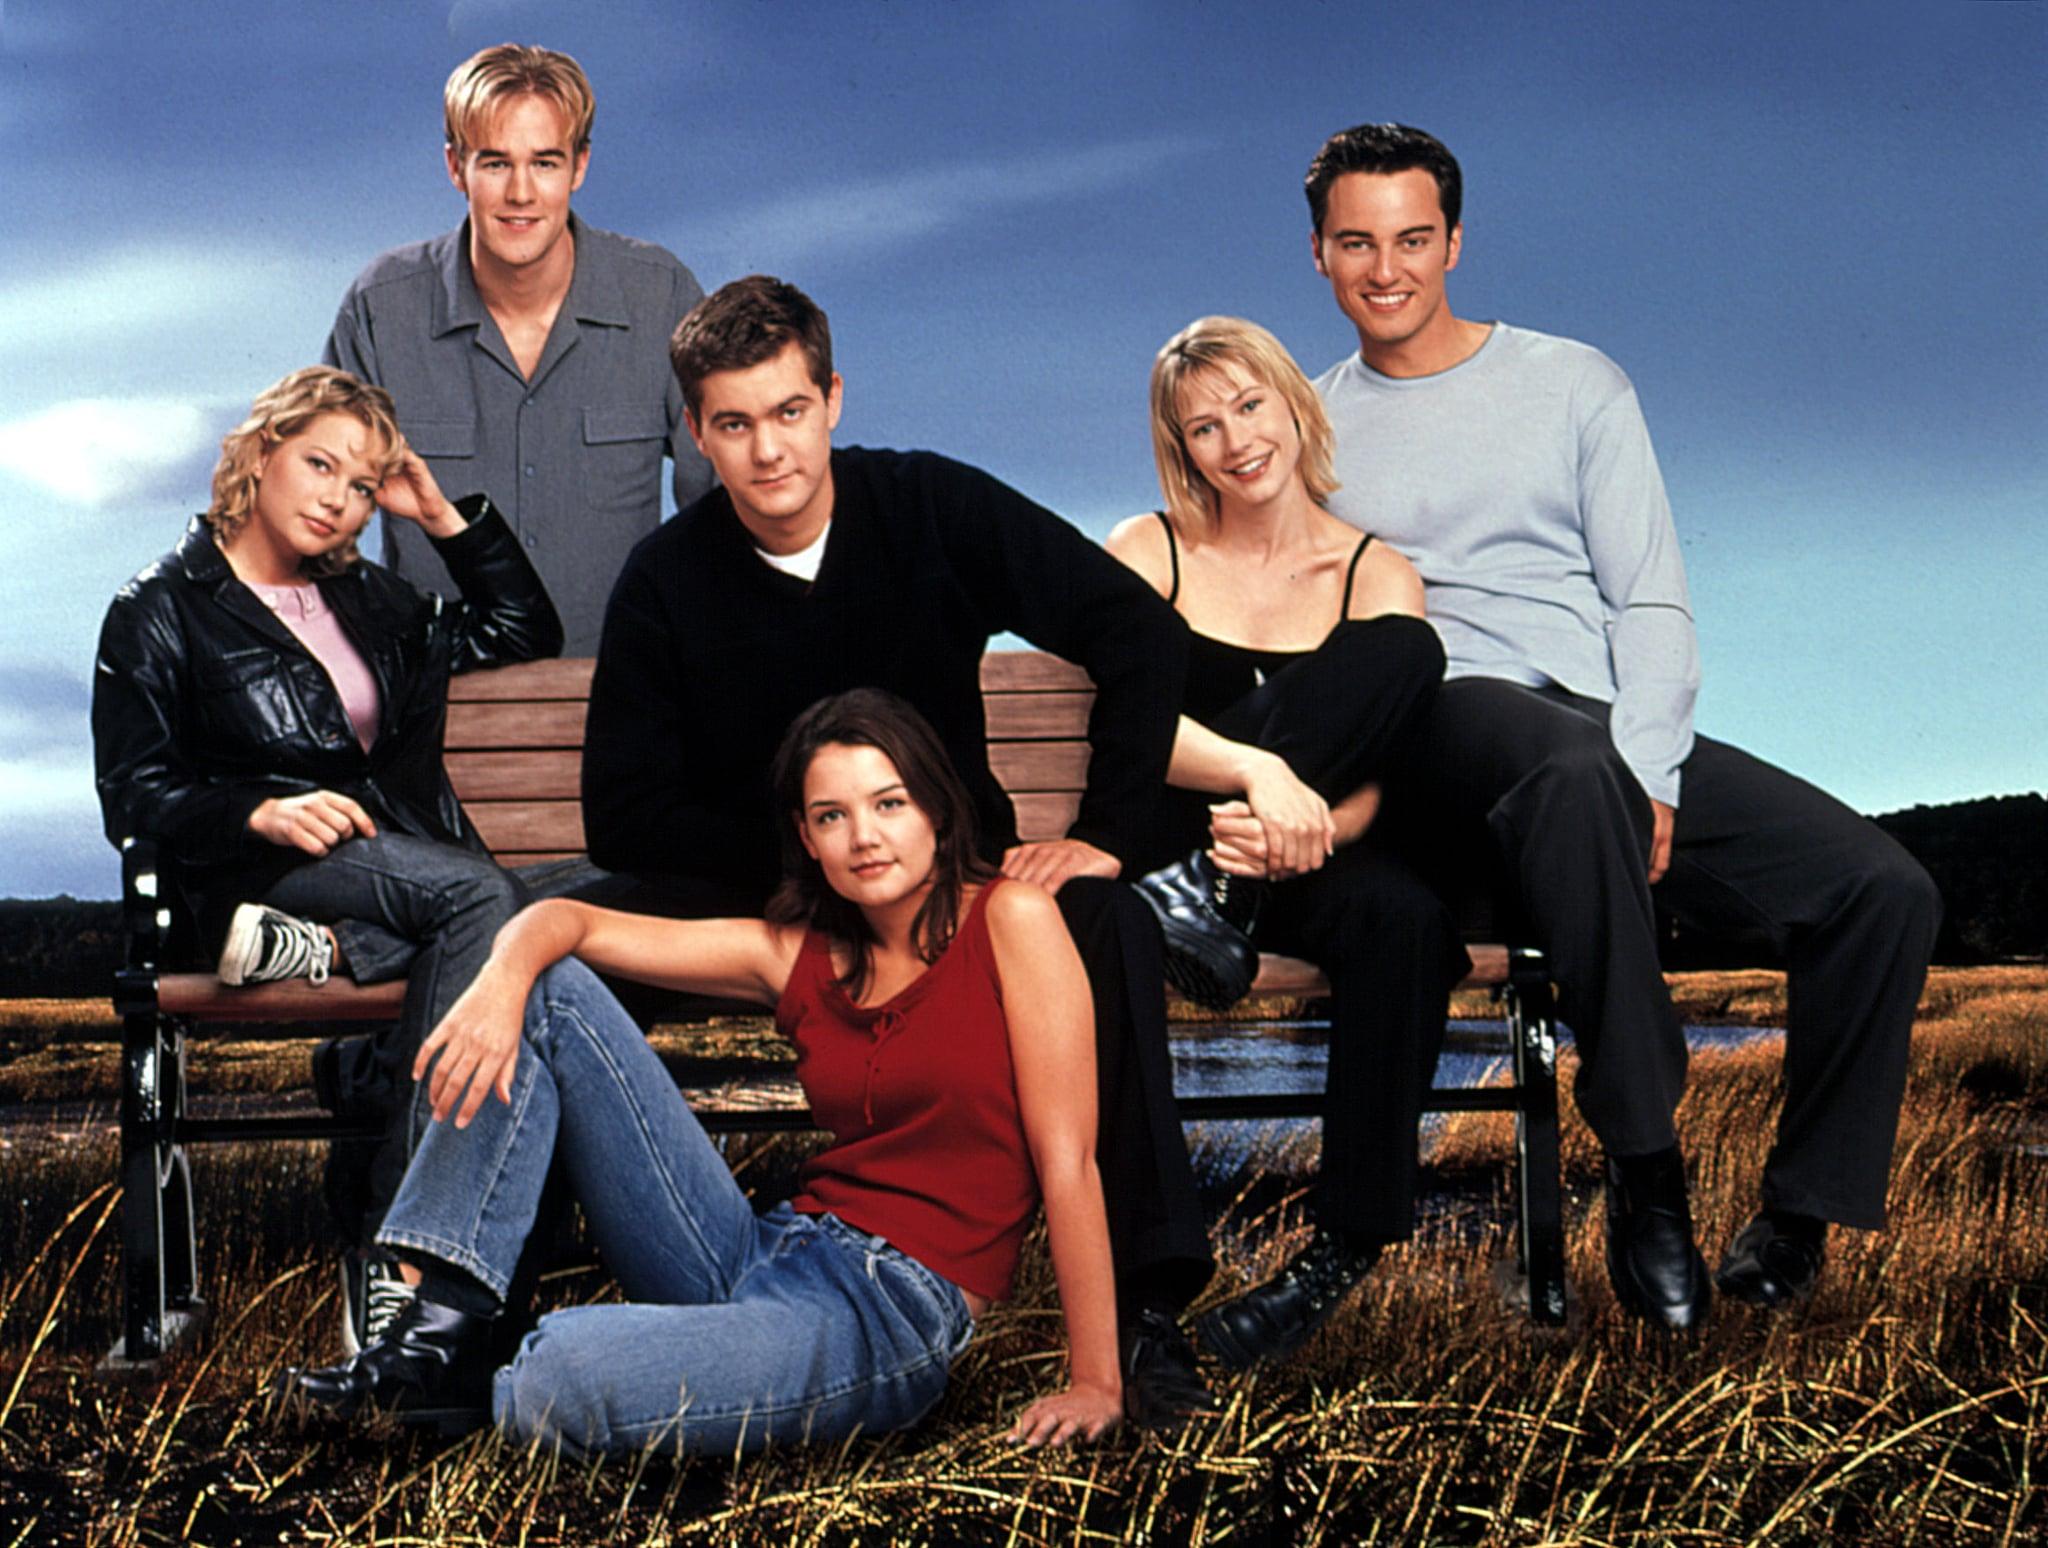 DAWSON'S CREEK, 1998-present, Michelle Williams, James Van Der Beek, Joshua Jackson, Meredith Monroe, Kerr Smith, 2000, yr3